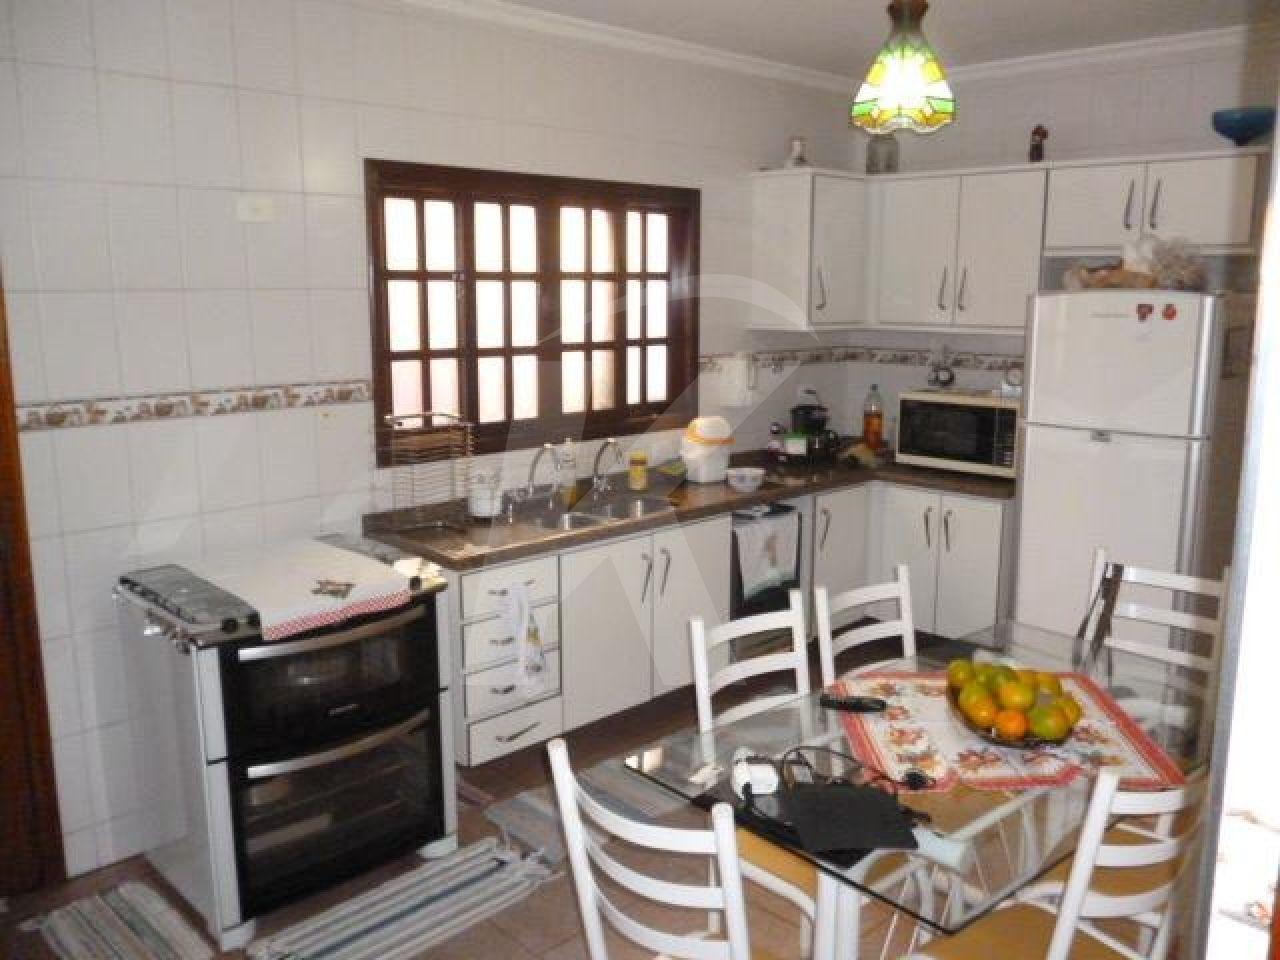 Sobrado Jardim Guapira - 3 Dormitório(s) - São Paulo - SP - REF. KA5599